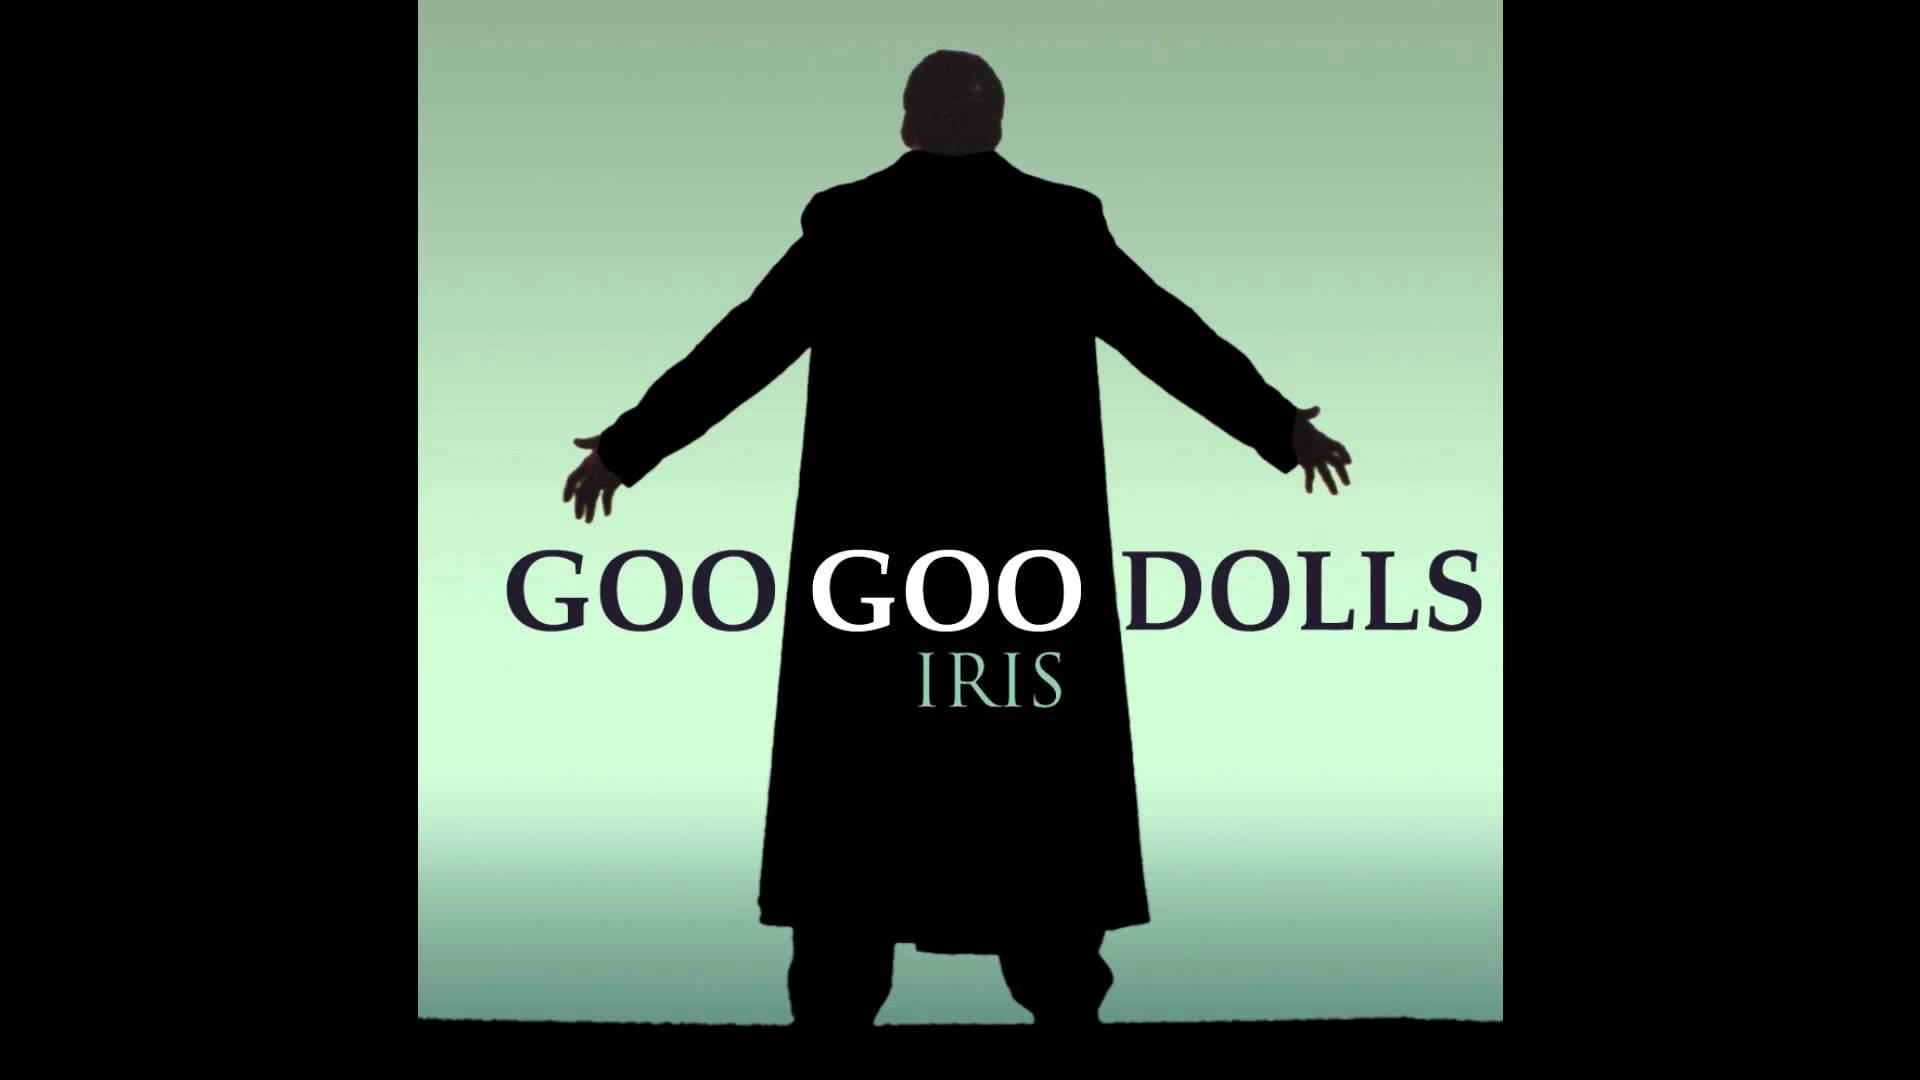 Iris By The Goo Goo Dolls Turns 20 Home To The Echo Radio Show